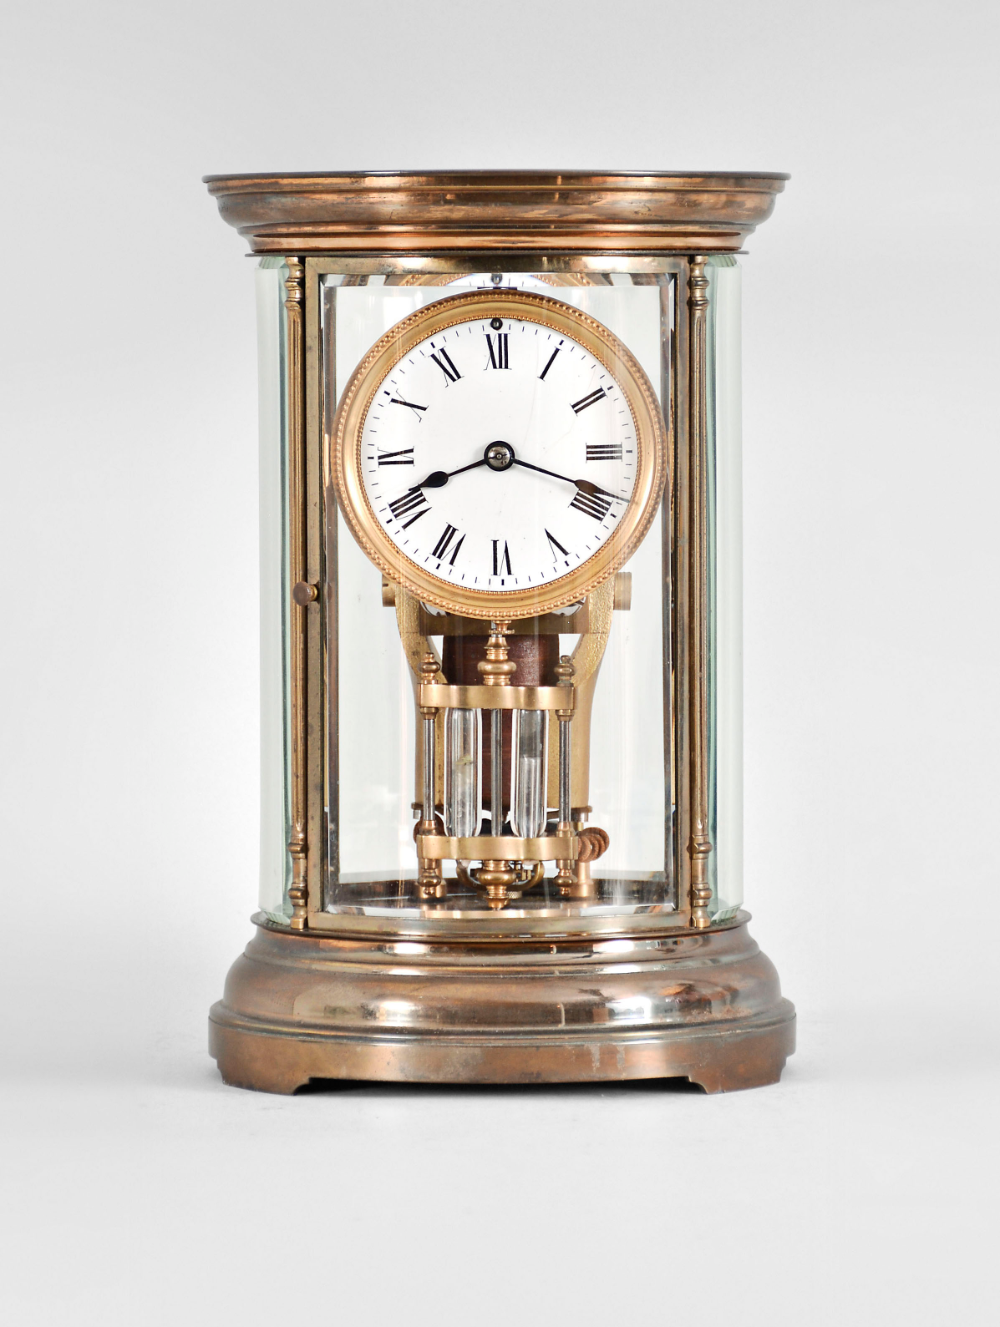 O Keenan Electromechanical Crystal Regulator In 2020 Clock Mantel Clock Crystals